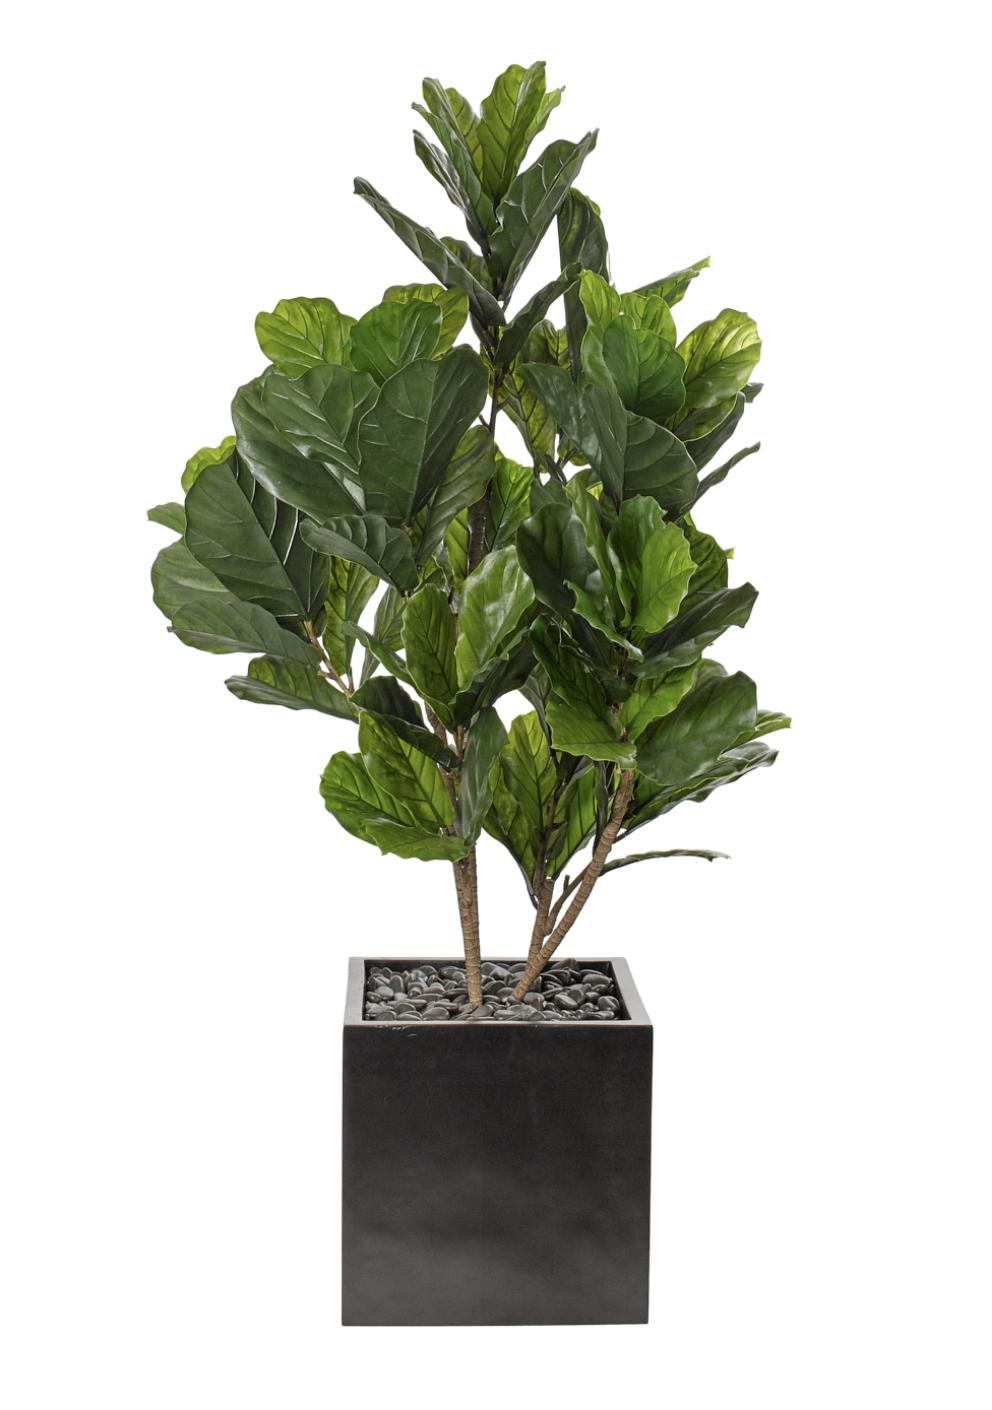 NDI Fiddle Leaf In Concrete Planter